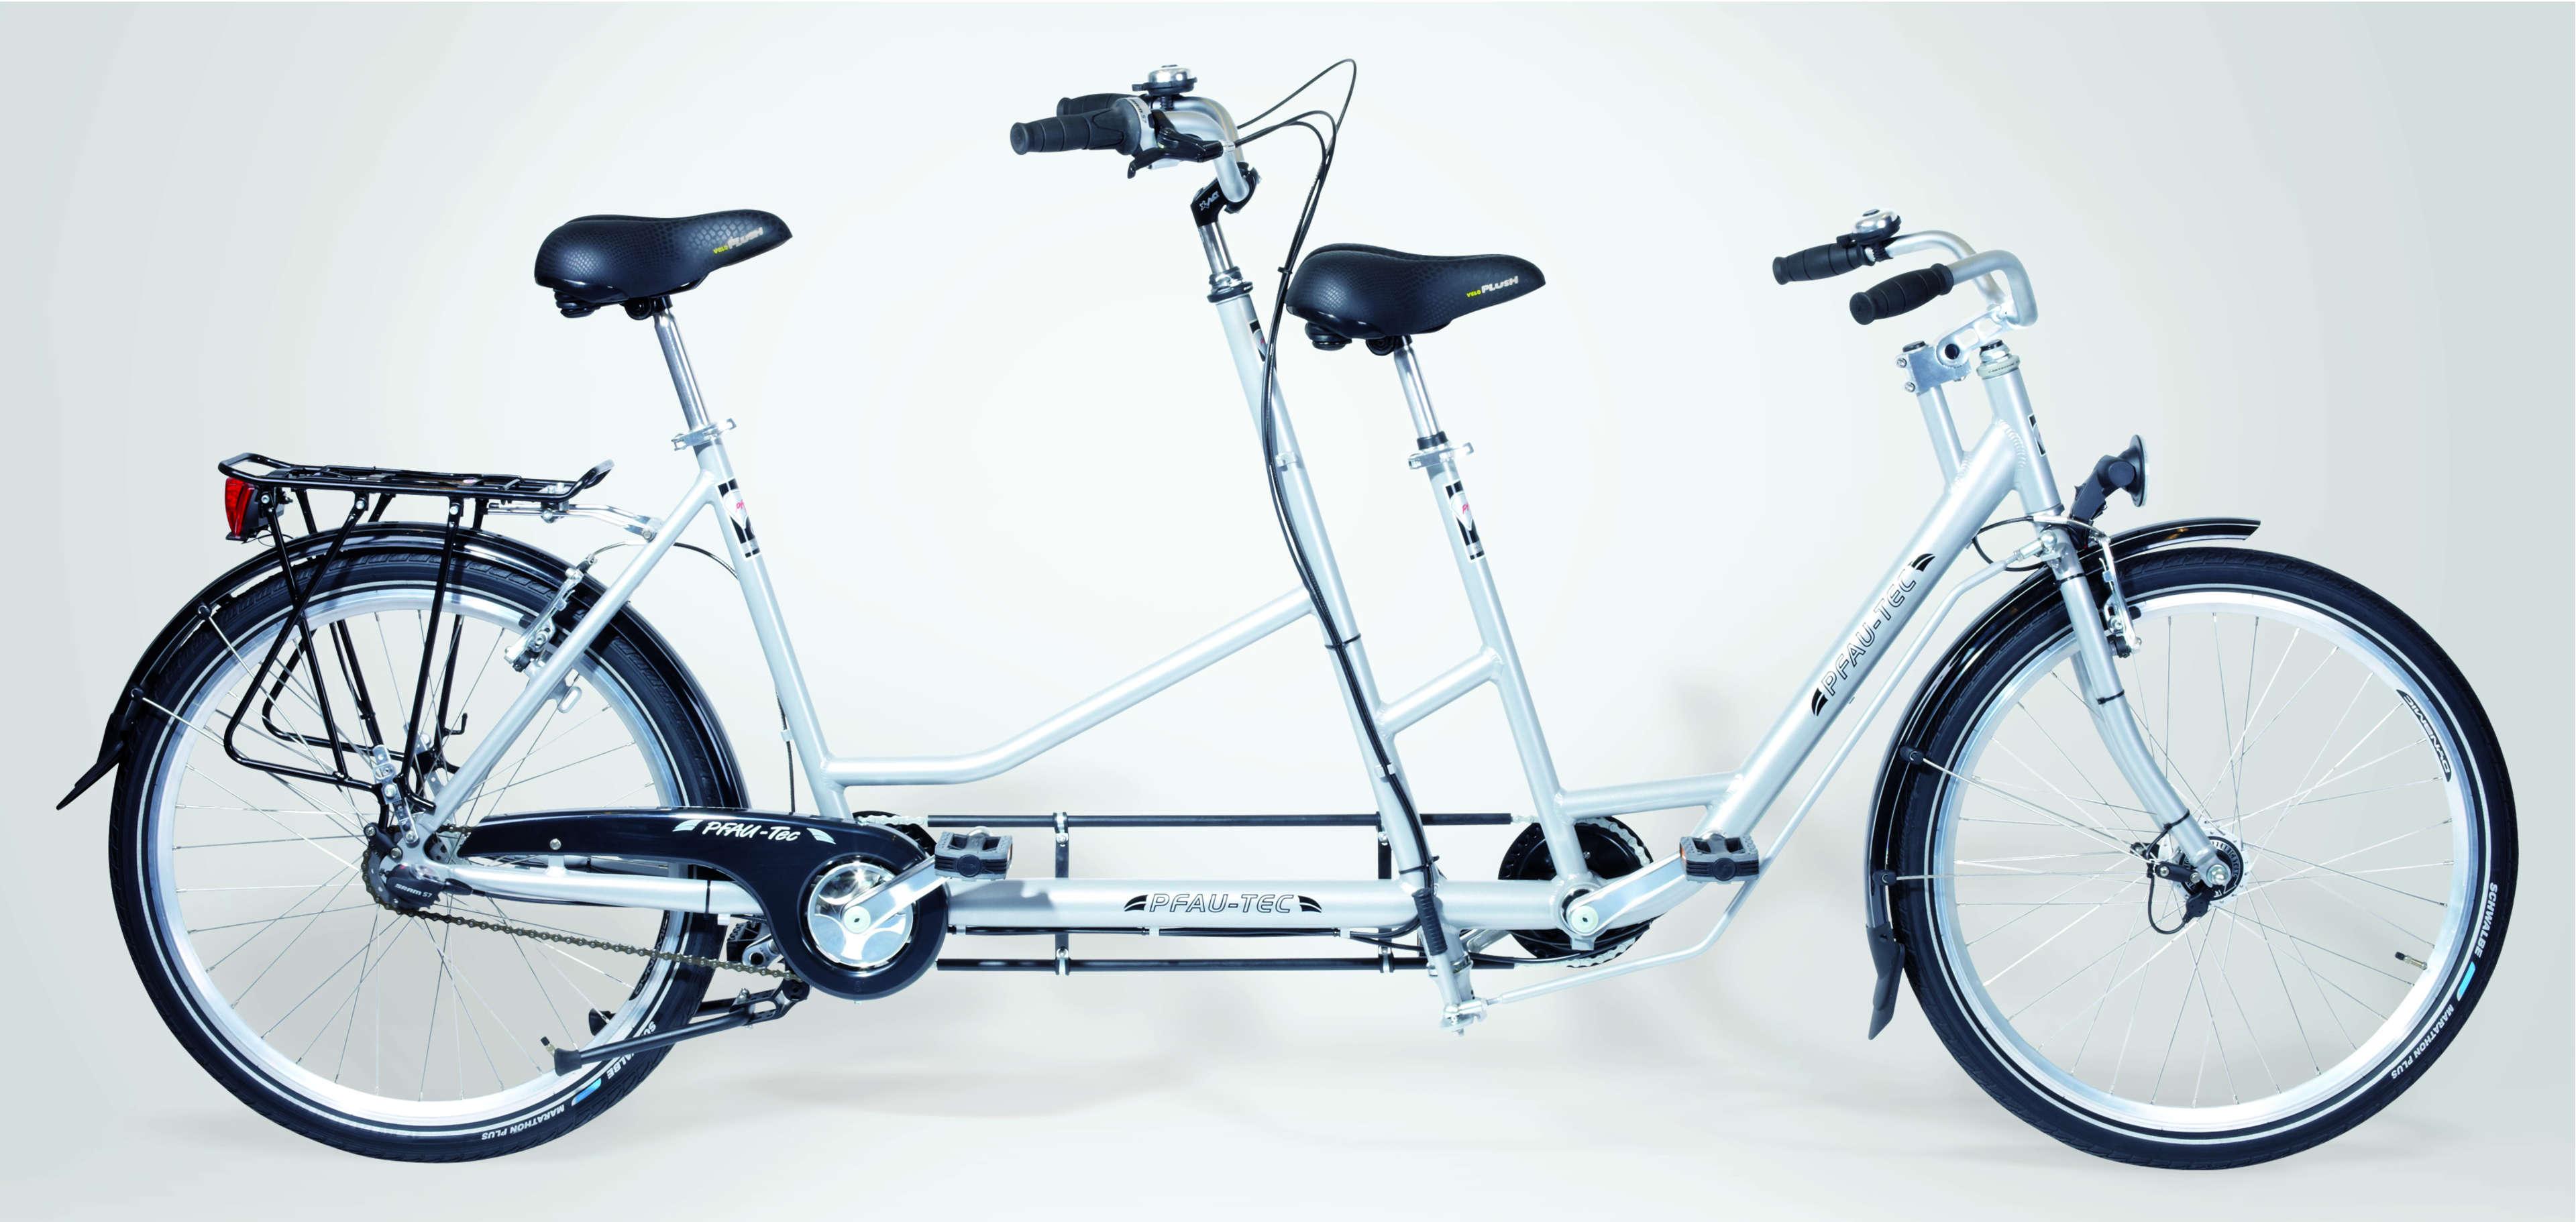 pfau tec compagno tandem eurorad bikeleasingeurorad bikeleasing. Black Bedroom Furniture Sets. Home Design Ideas